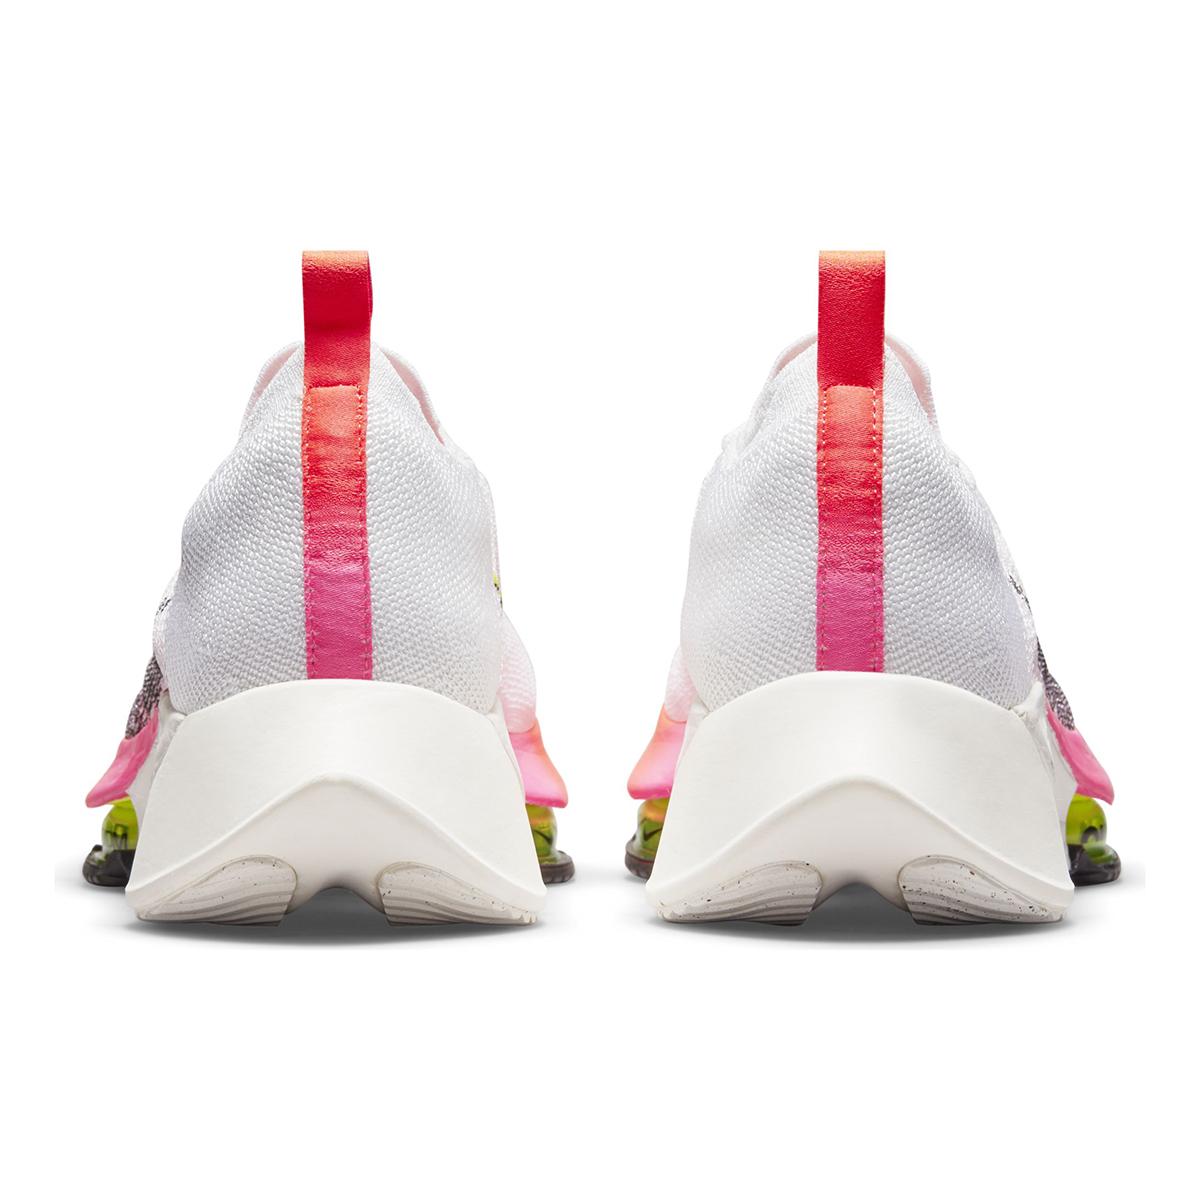 Men's Nike Air Zoom Tempo Next% Flyknit Running Shoe - Color: Rawdacious - Size: 6 - Width: Regular, Rawdacious, large, image 6